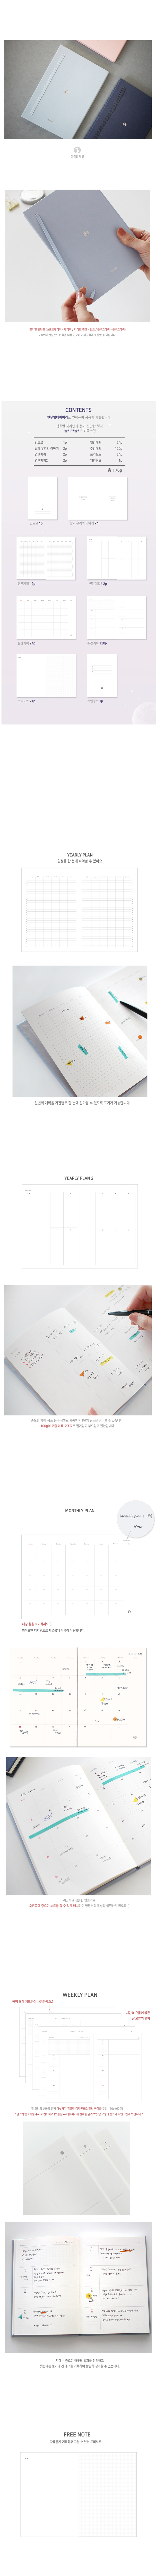 Moon diary Special edition - 대시앤도트, 15,000원, 만년형, 심플/베이직